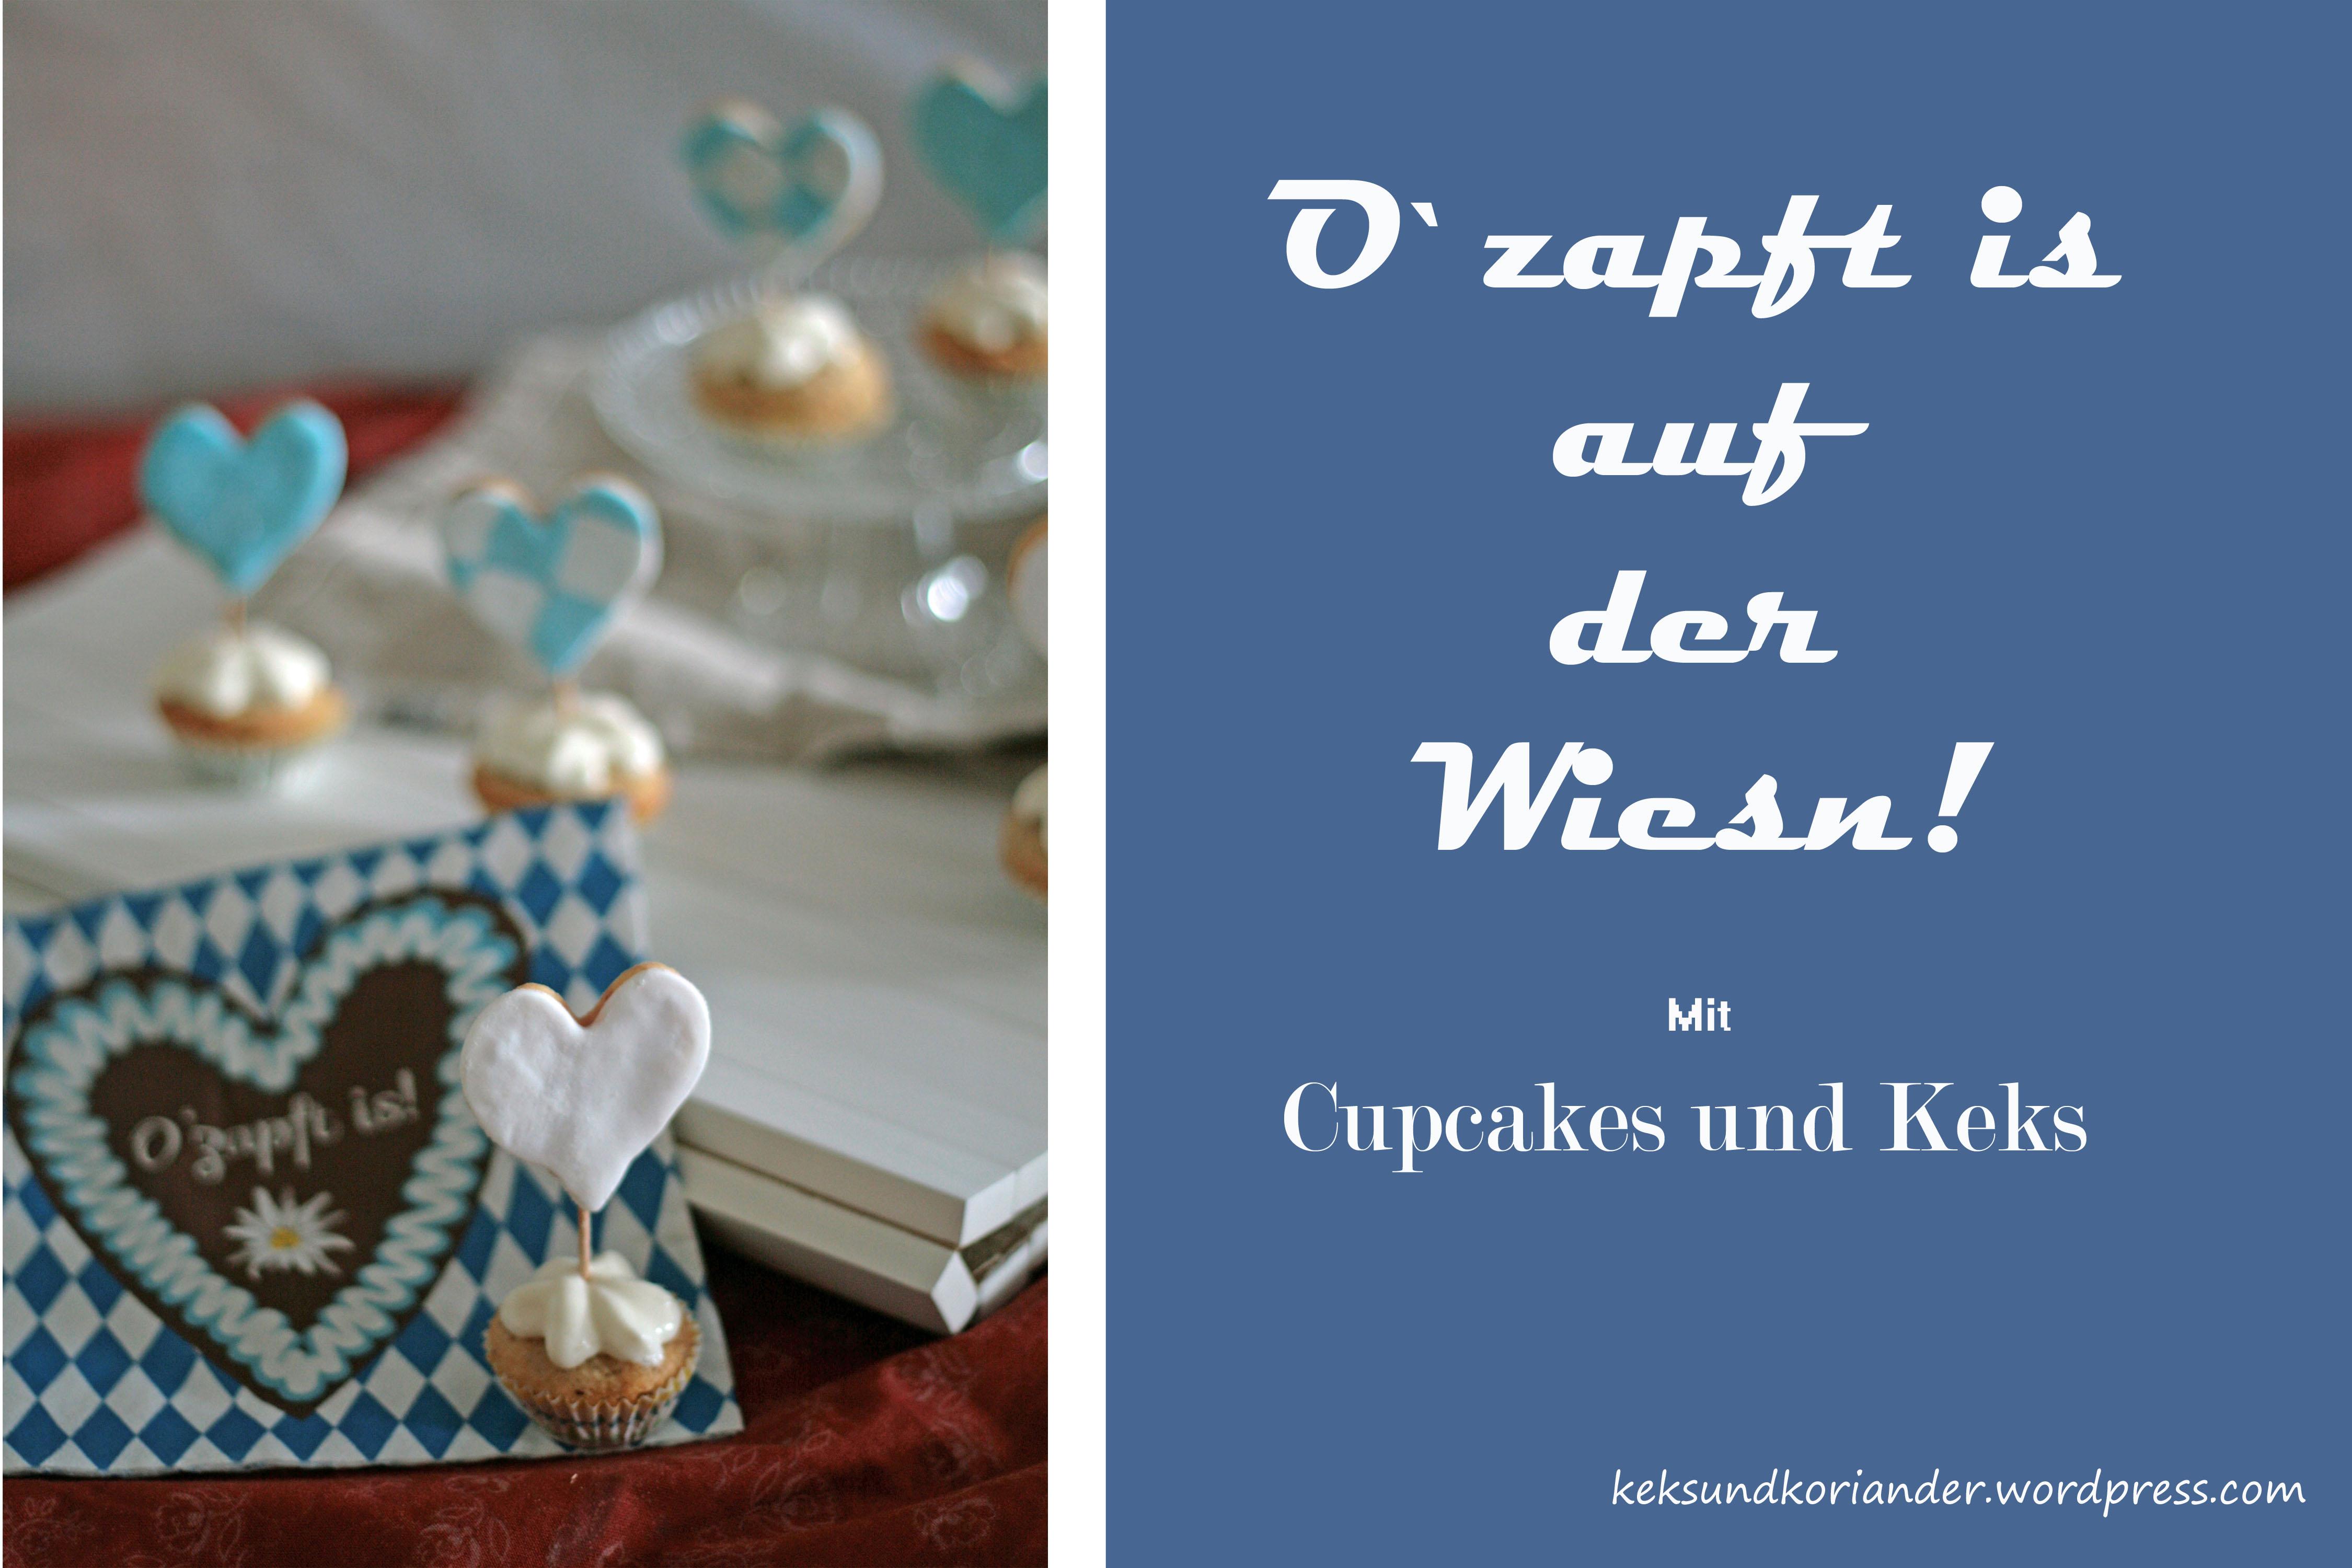 Cupcake Muffins Nussmuffin Topping Keks Wiesn4